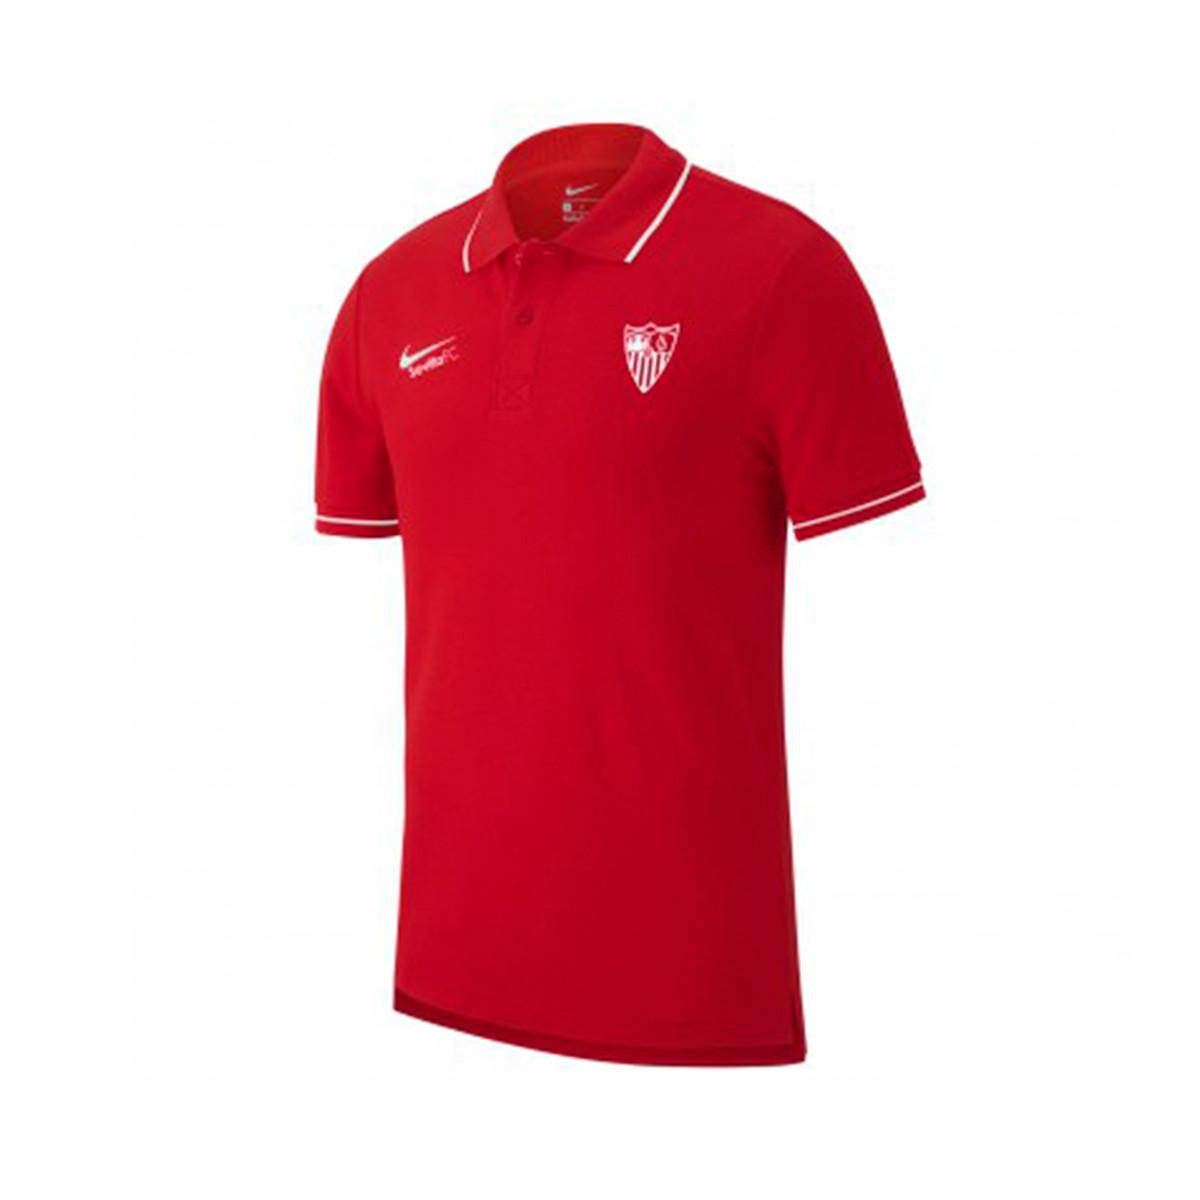 más baratas Tienda oficial Polo shirt Nike Sevilla FC Passeio 2019-2020 Red - Football store ...